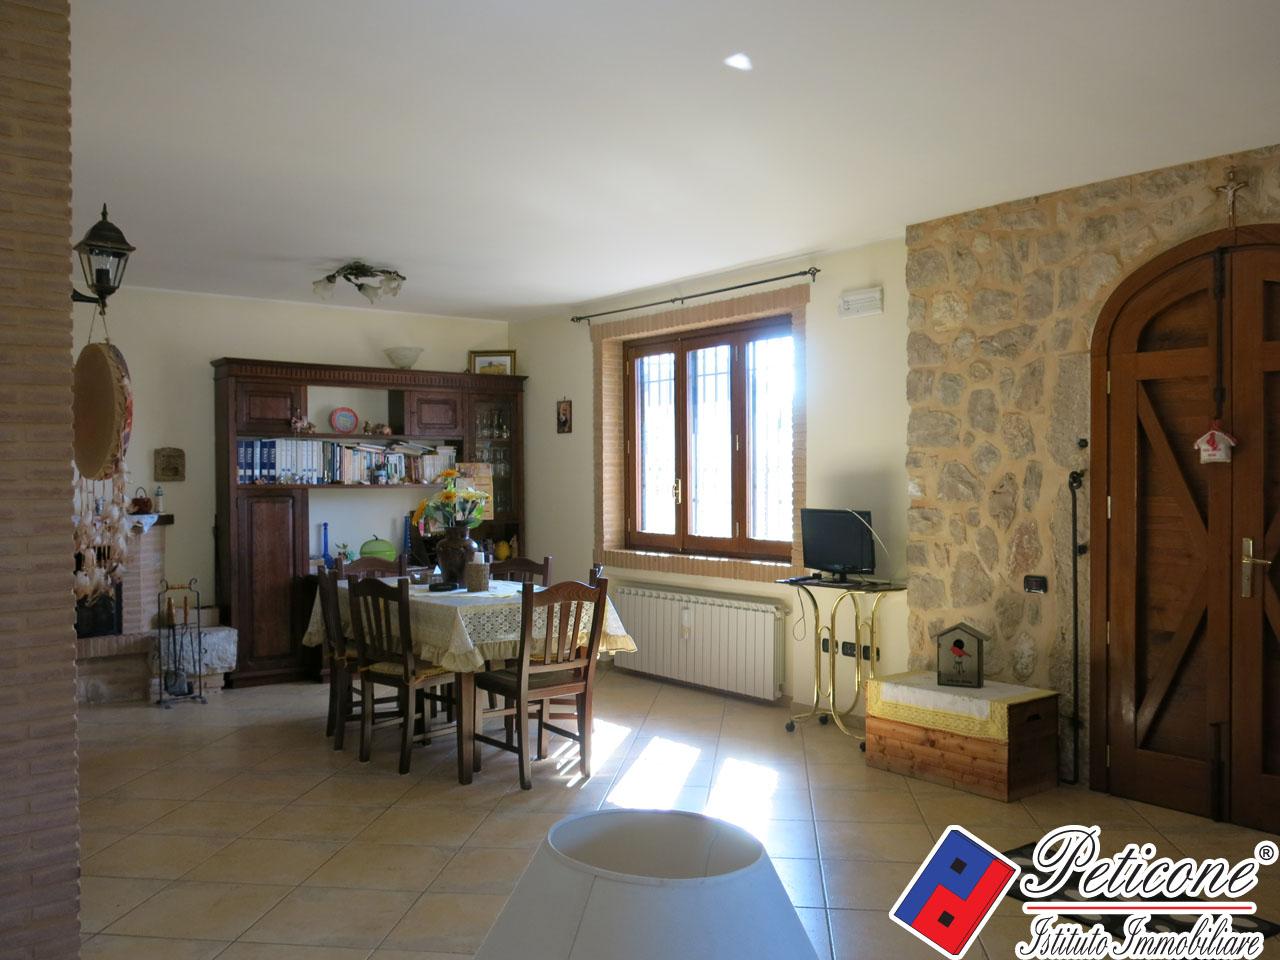 Villa in Vendita a Fondi: 3 locali, 107 mq - Foto 4